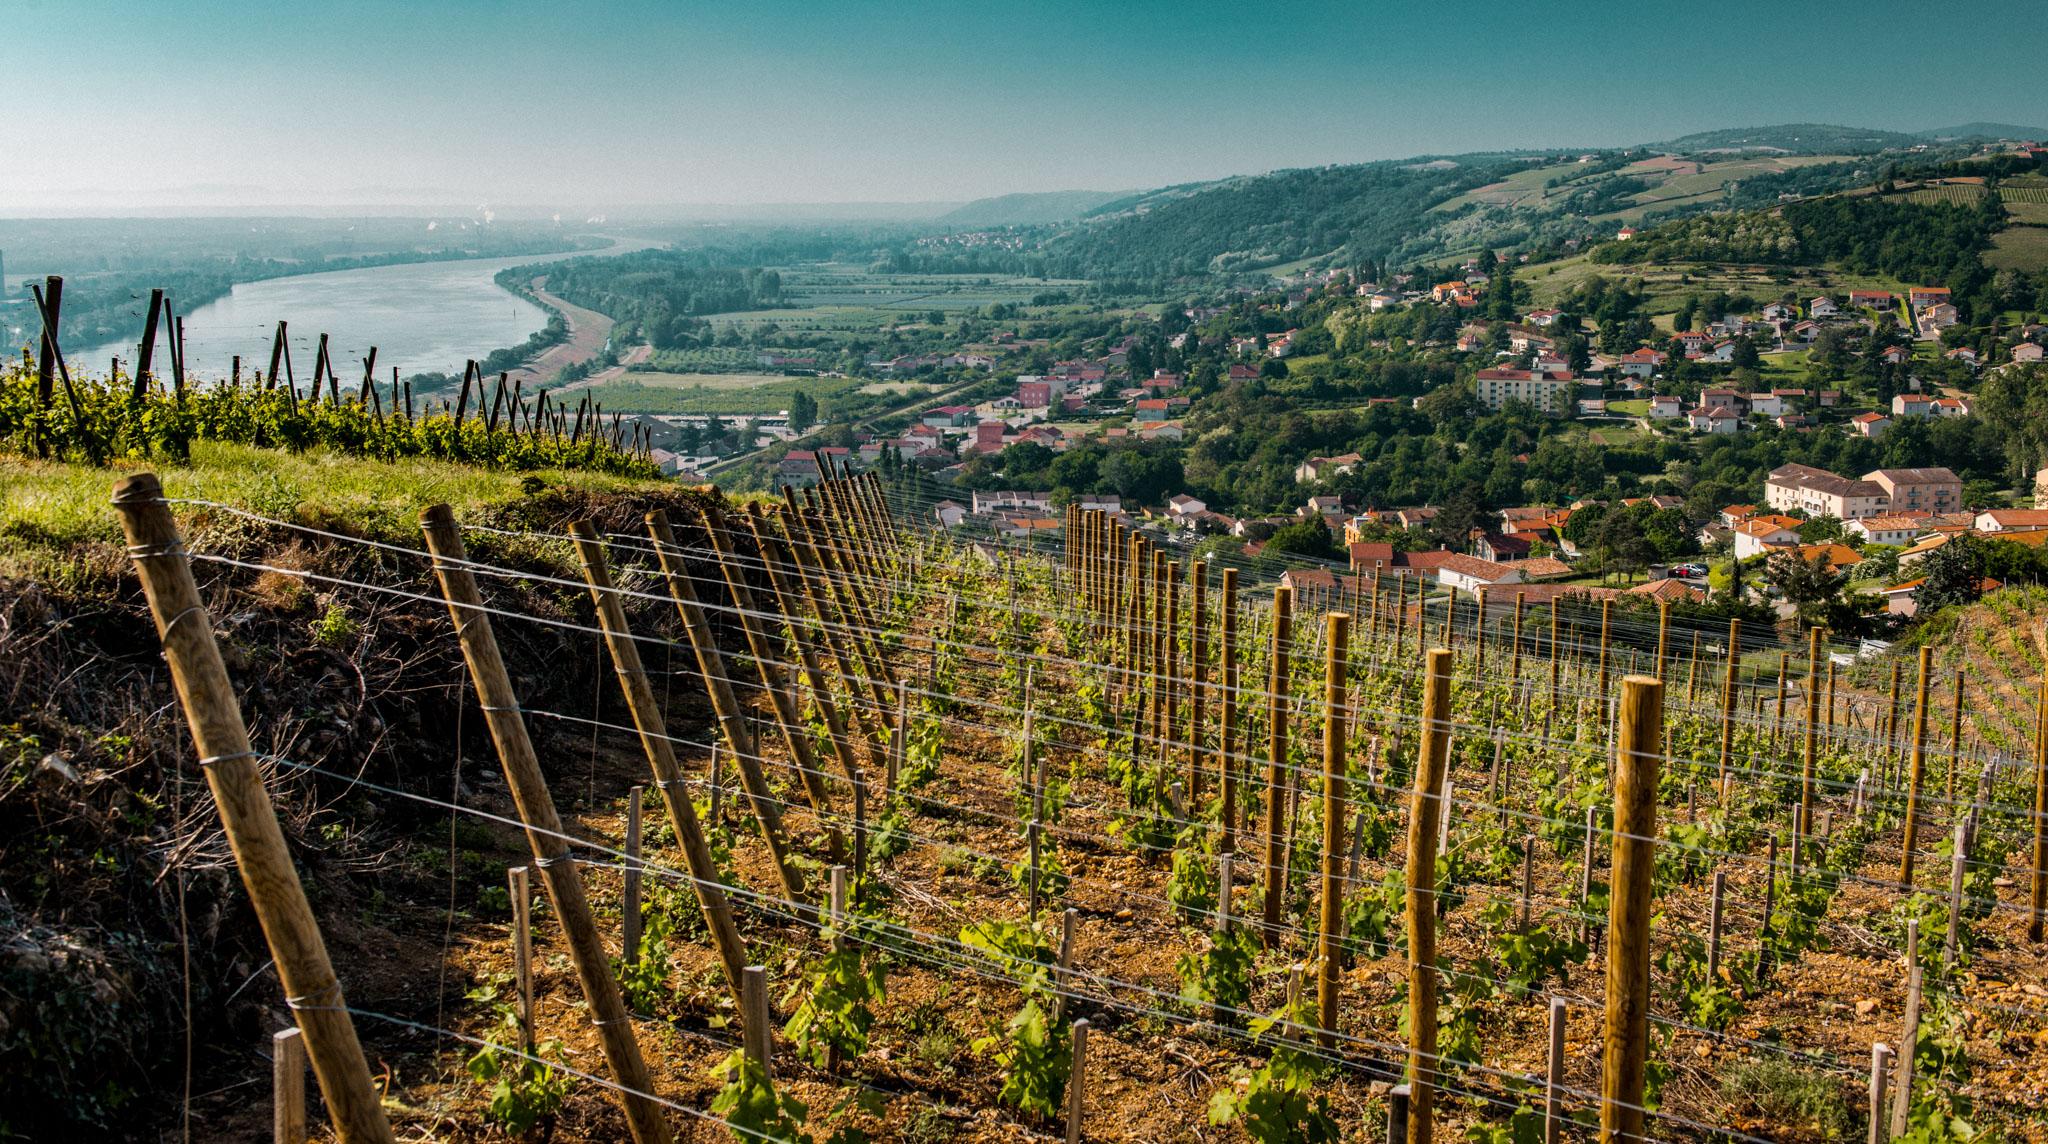 France : Northern Rhone :La Cote vineyard in Chavanay, growing Viognier for Condrieu AOC